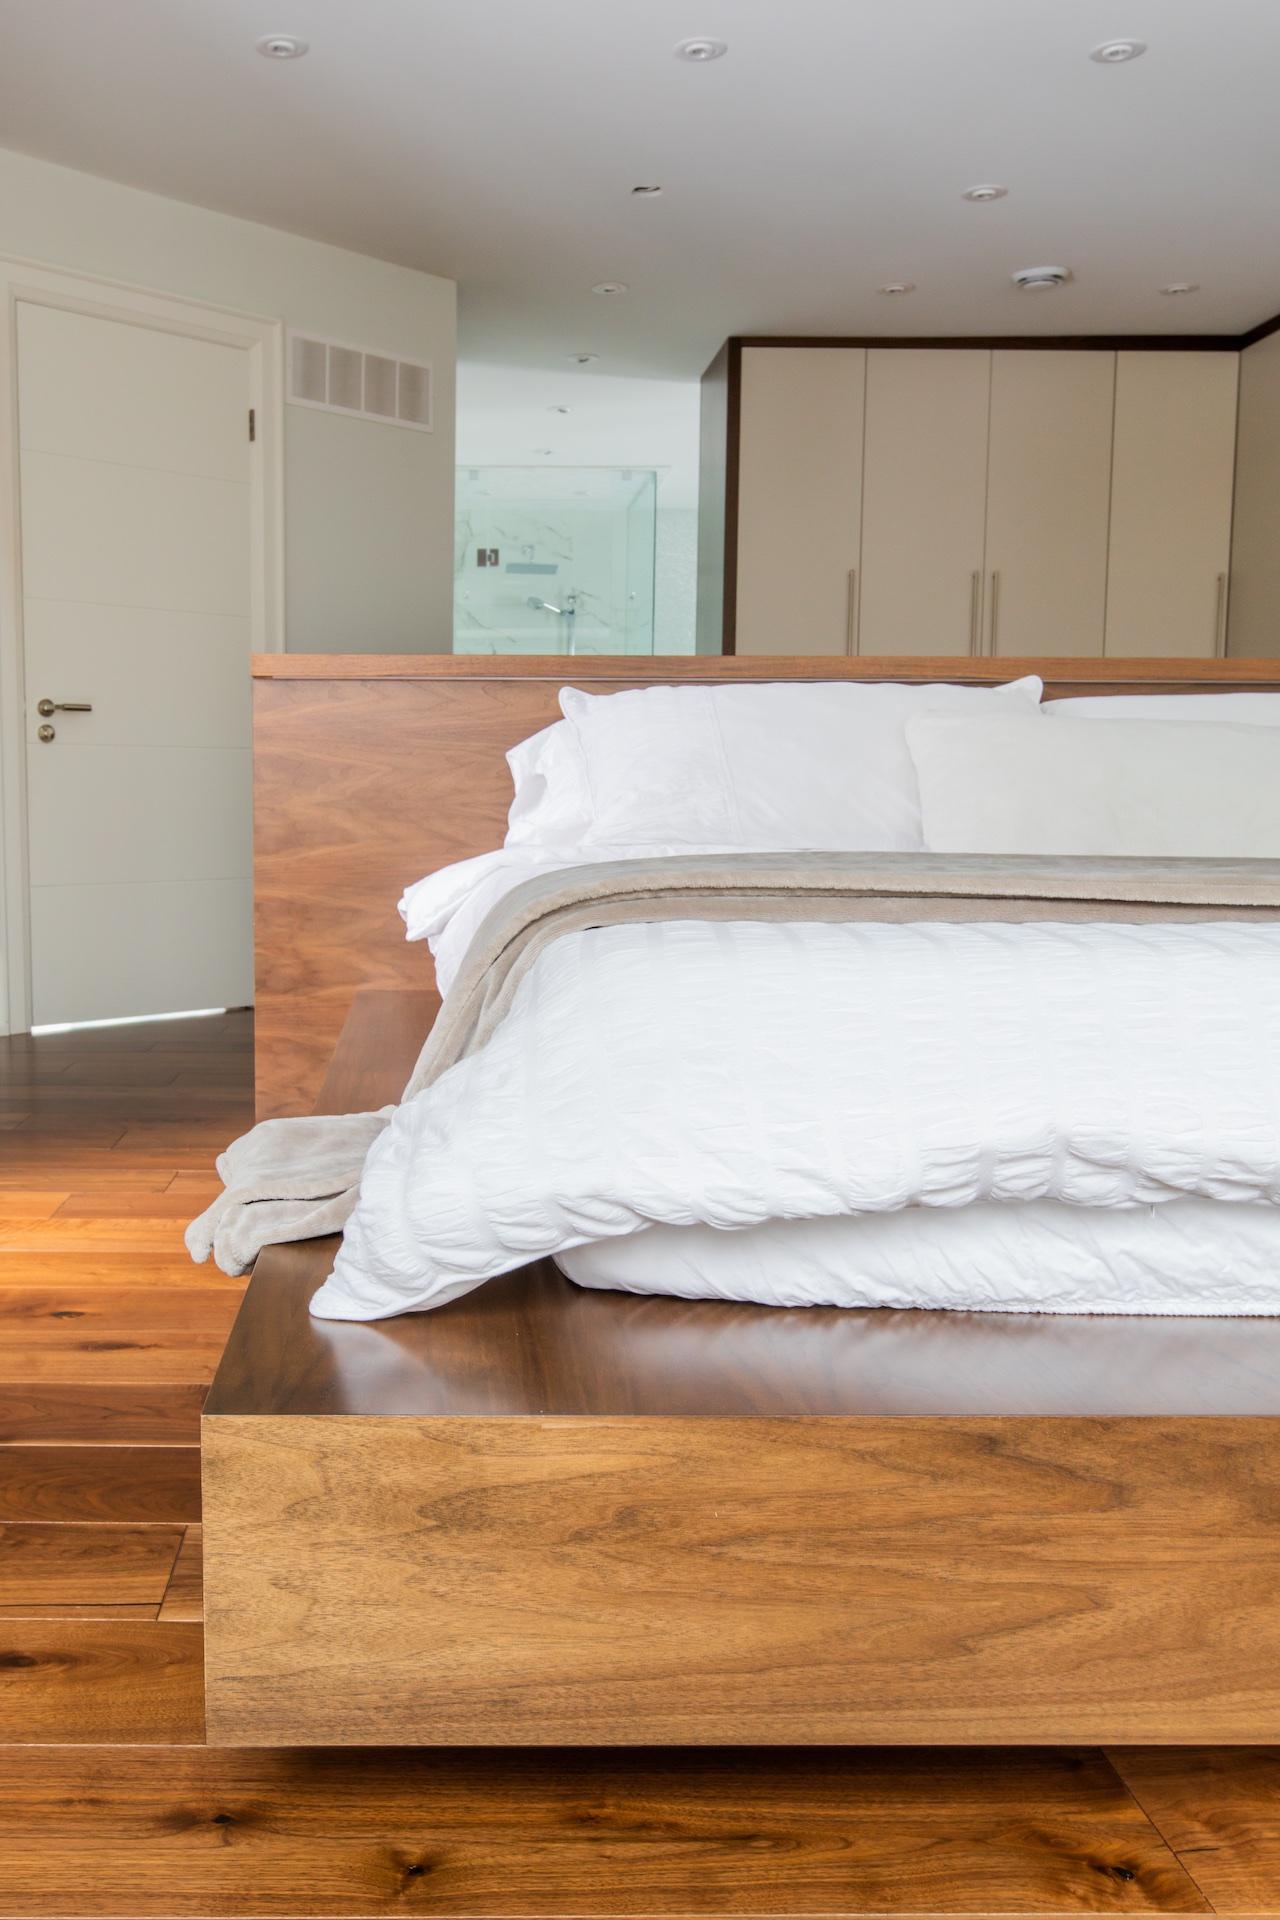 Wood bedframe